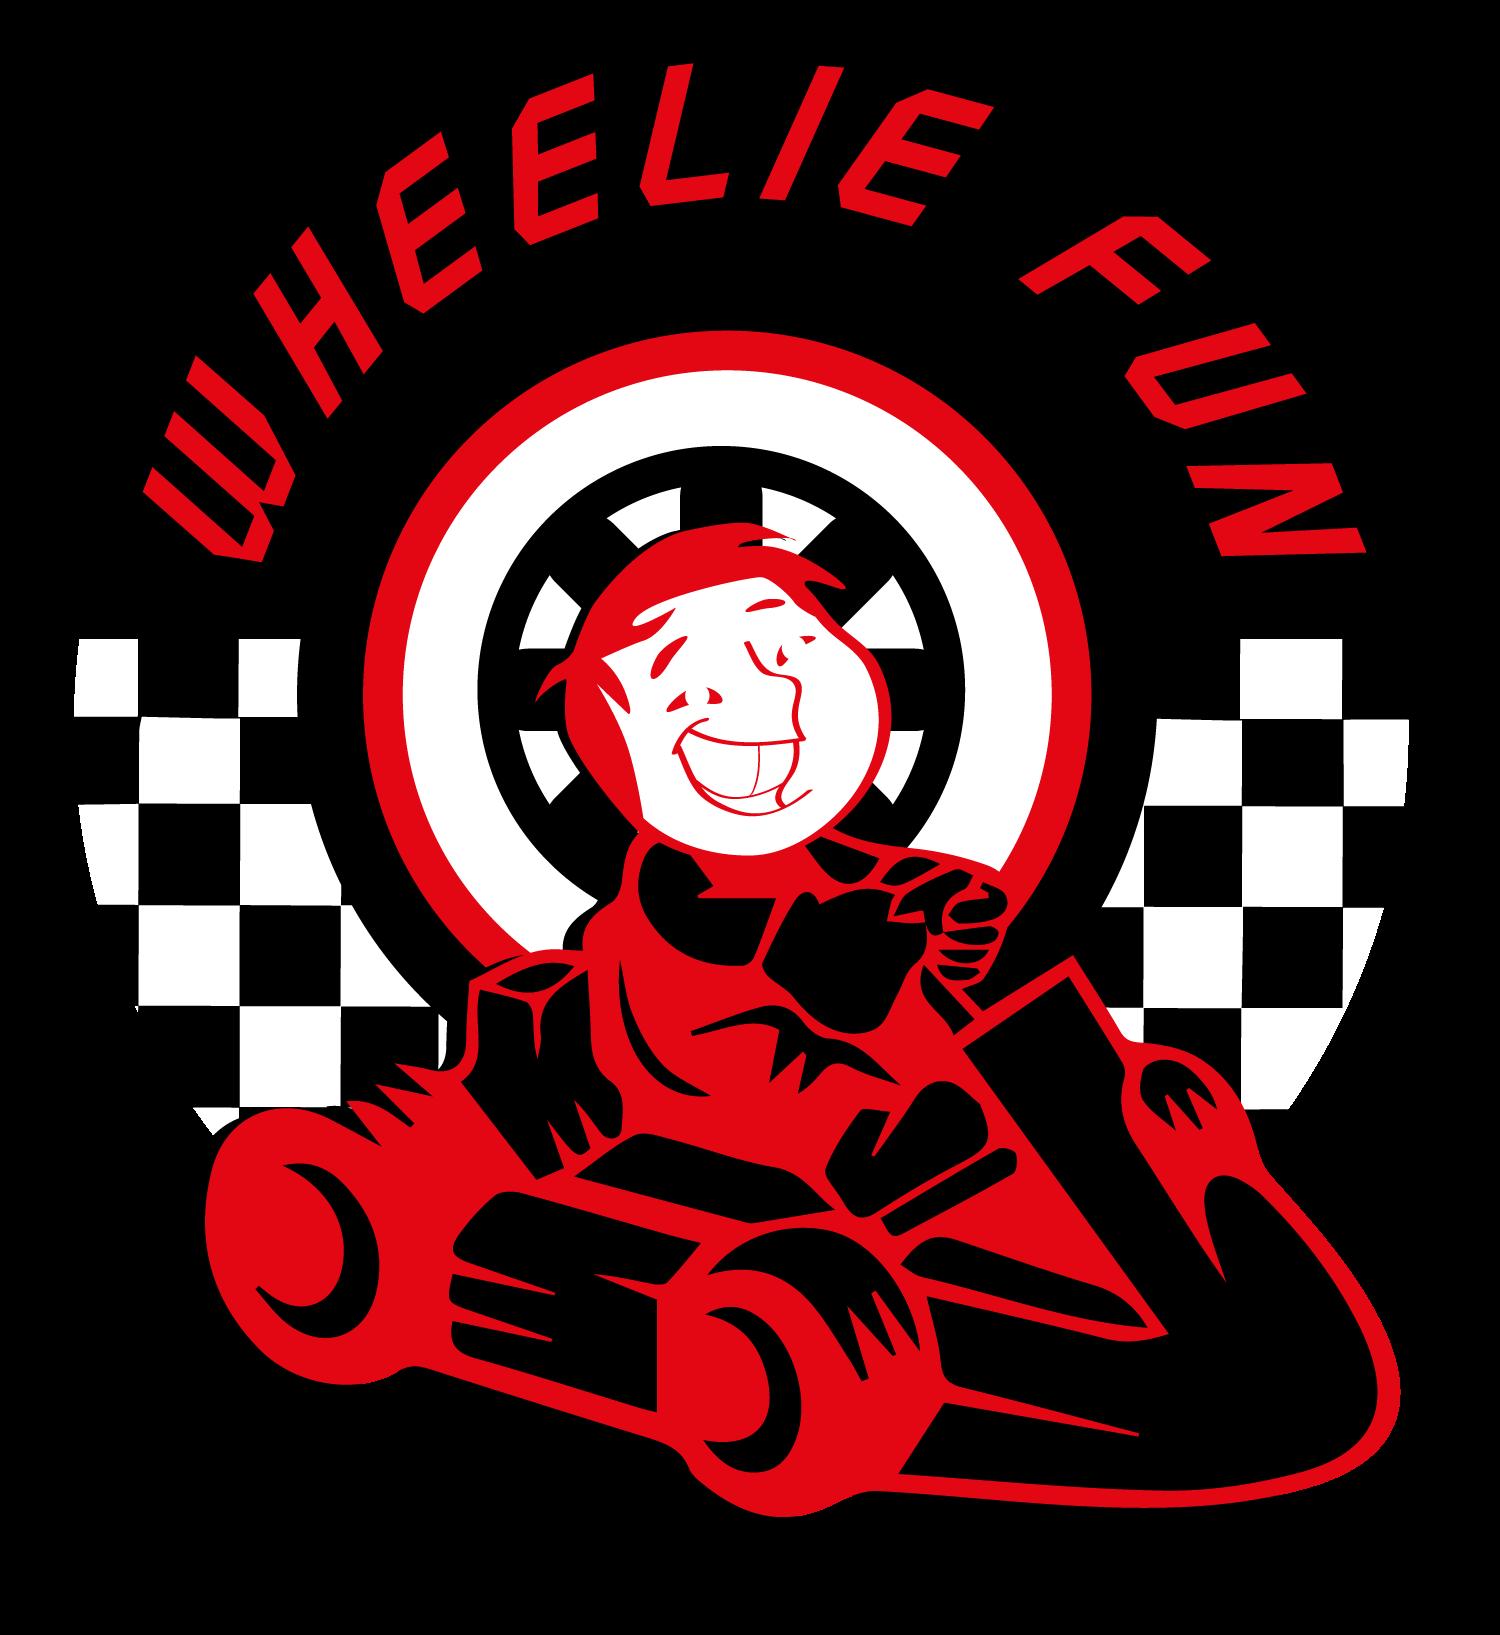 Wheelie Fun